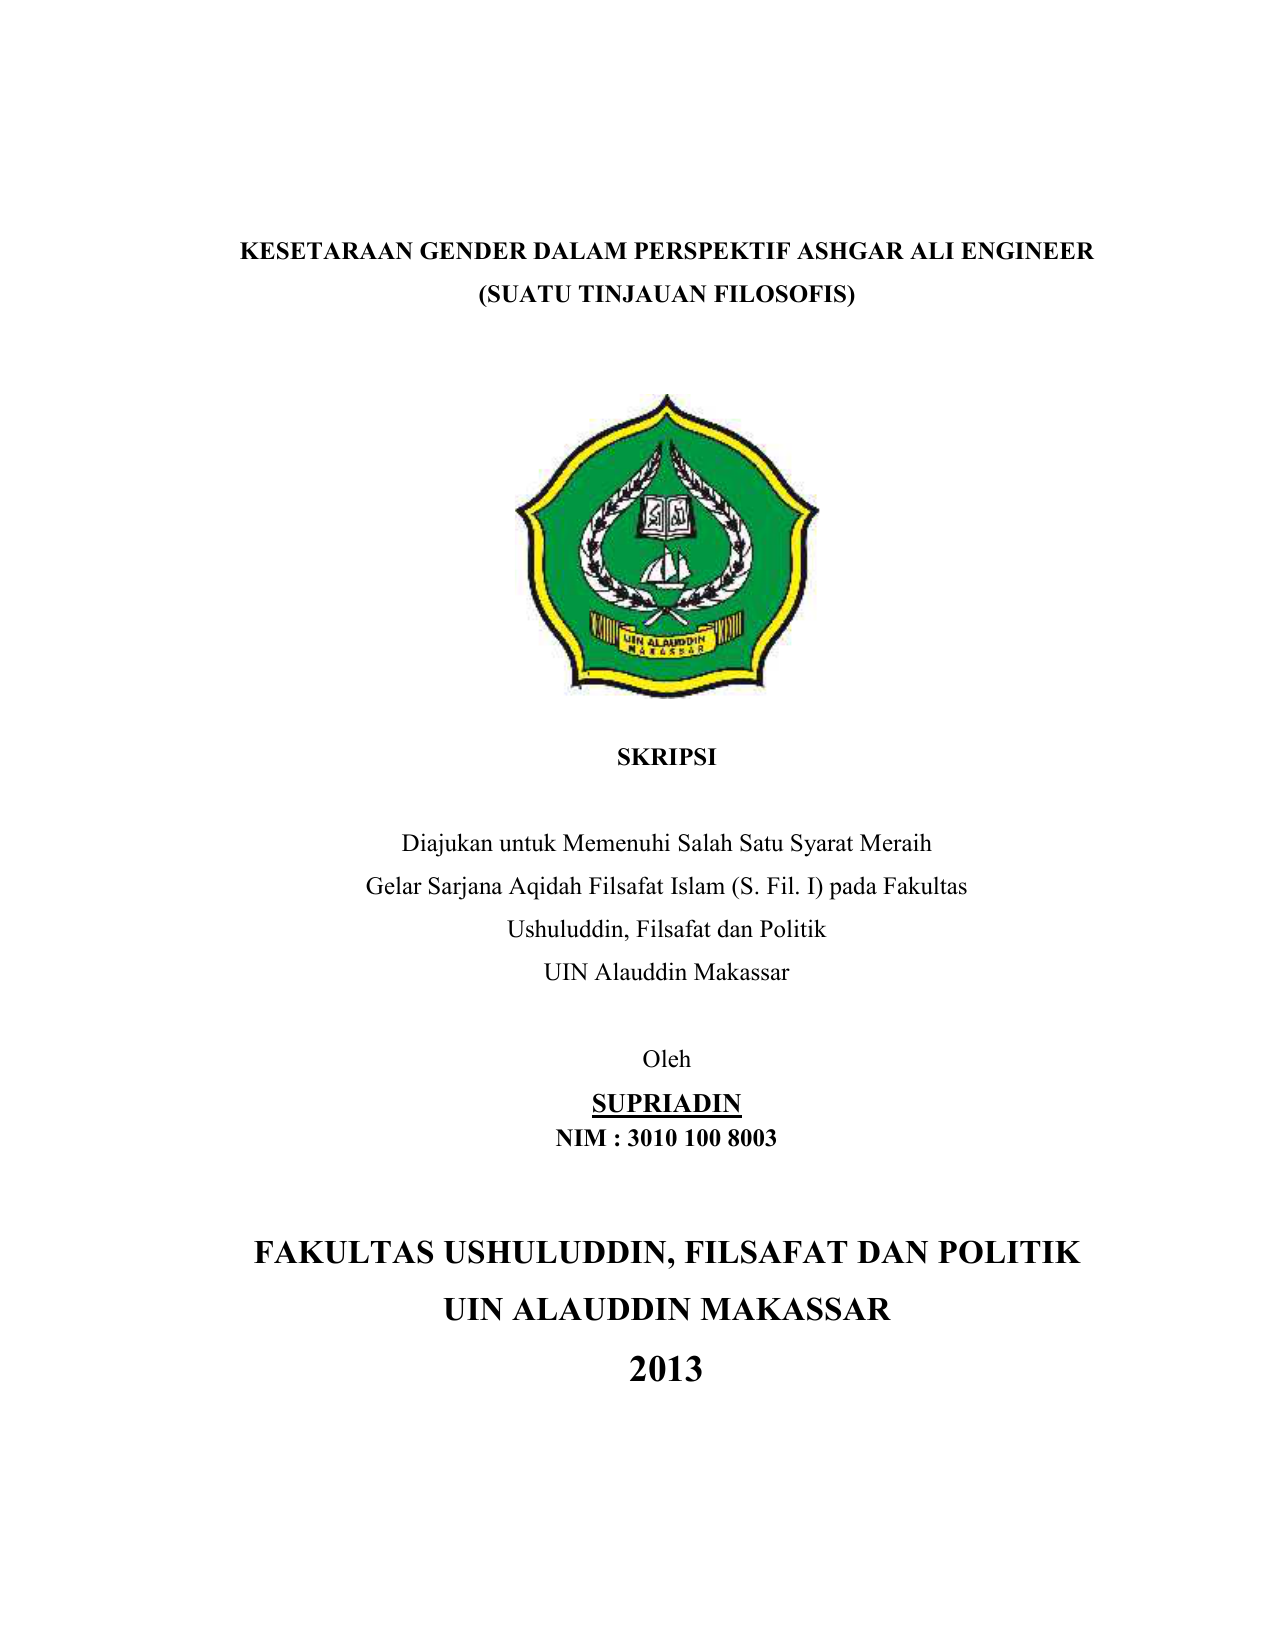 Fakultas Ushuluddin Filsafat Dan Politik Uin Alauddin Makassar